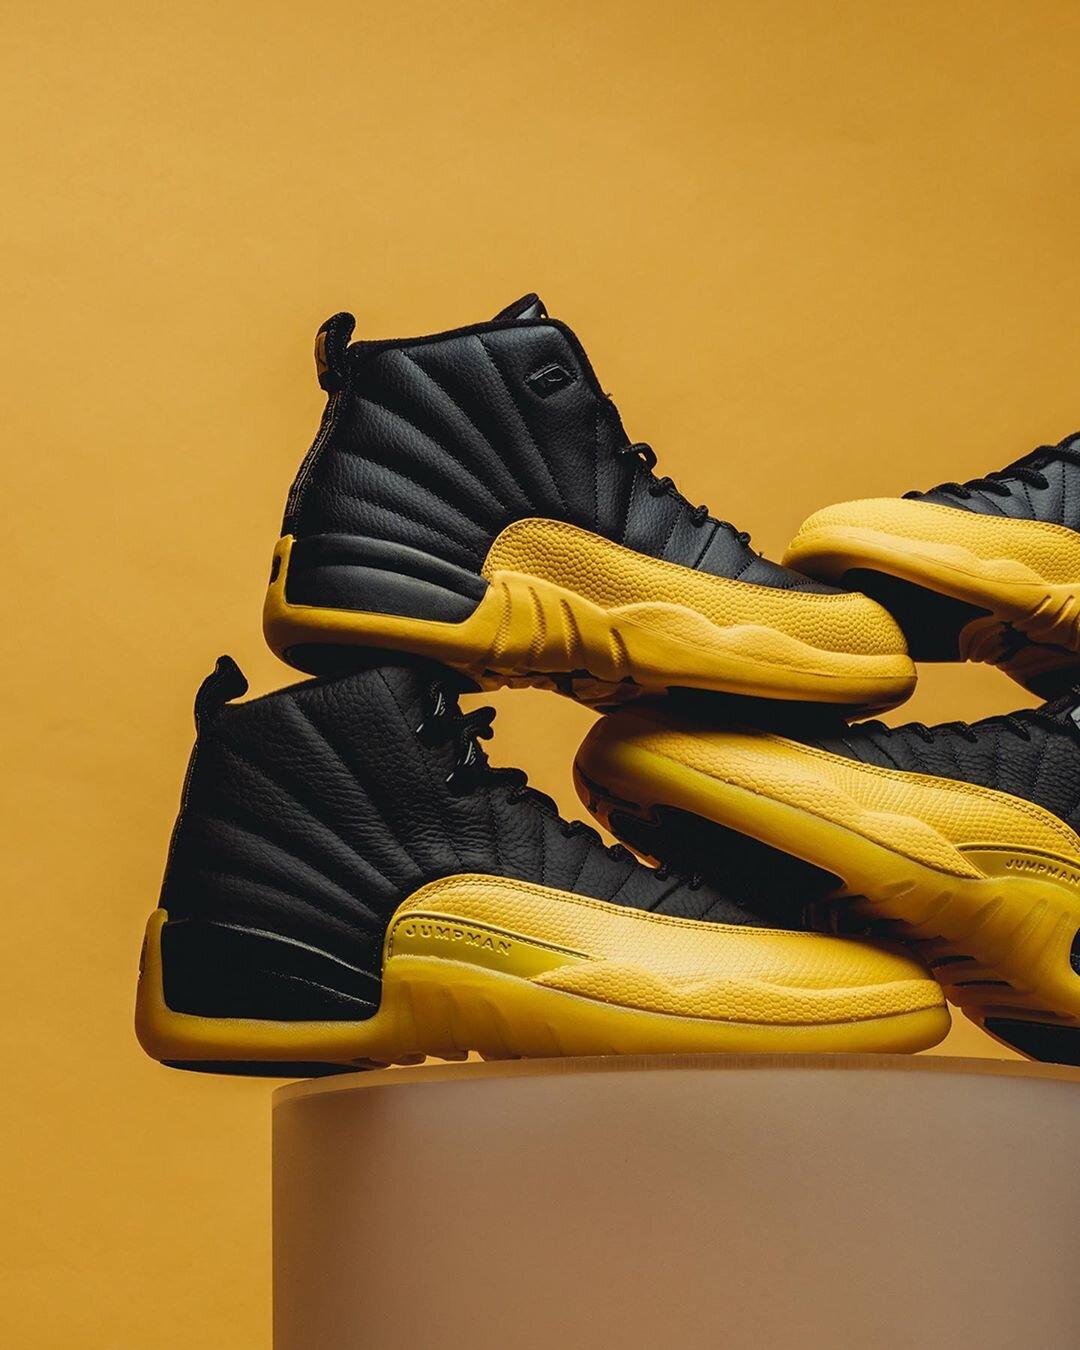 Restock Air Jordan 12 Retro University Gold Sneaker Shouts